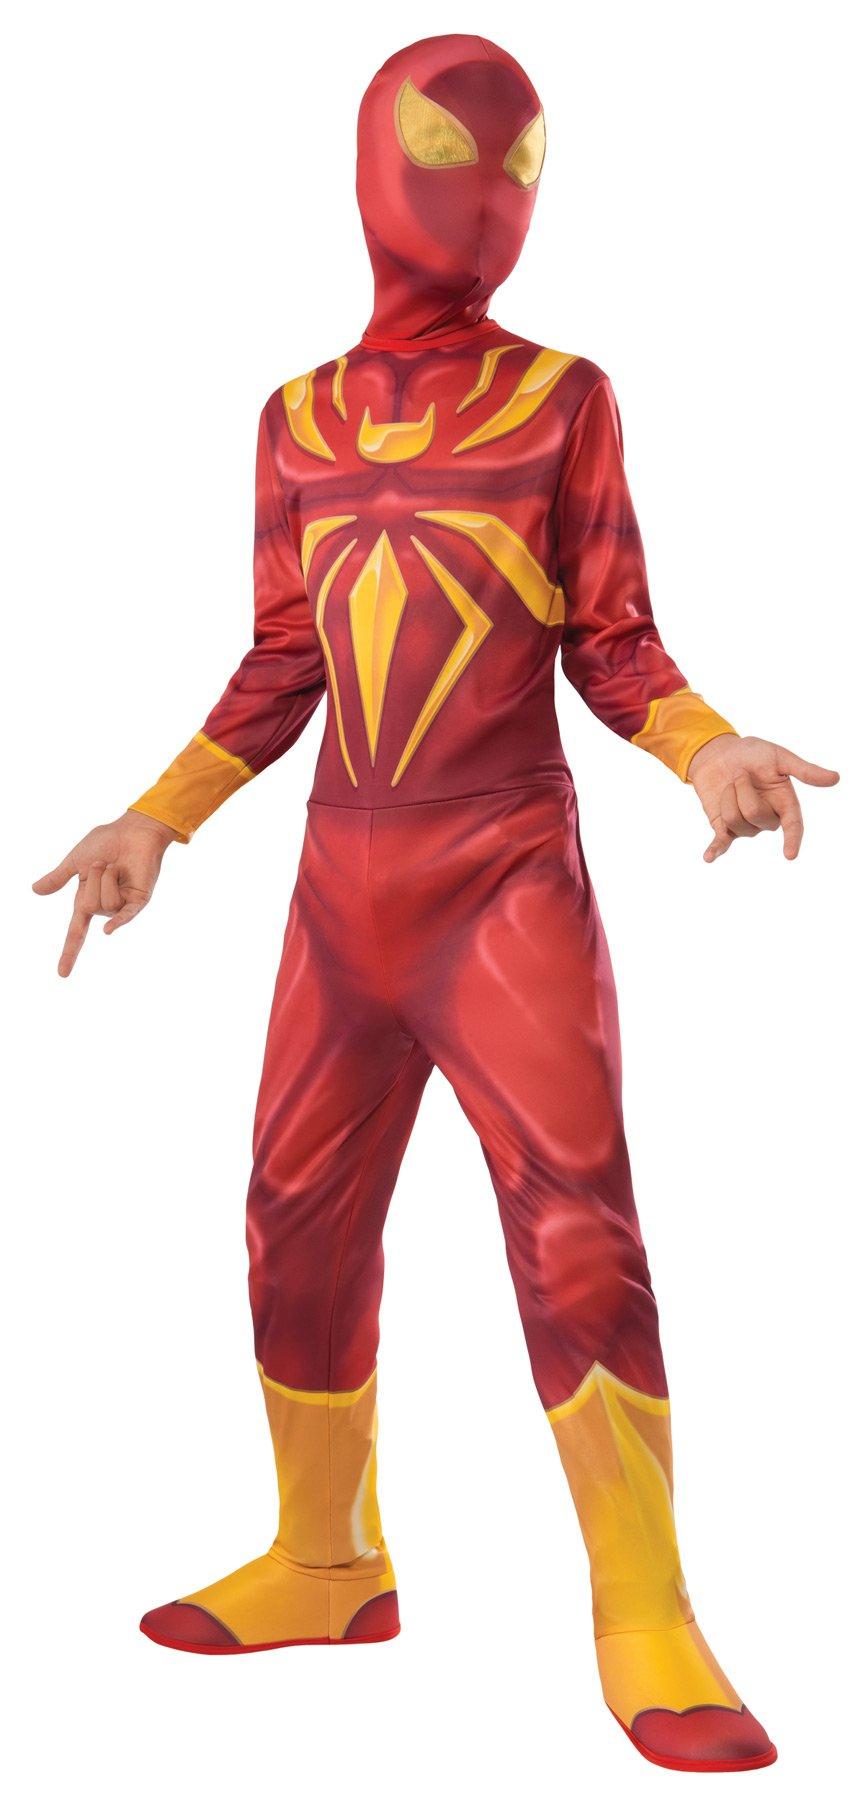 - 61Hs15zdJXL - Rubie's Boy's Iron Spider Jumpsuit Superhero Fancy Dress Child Halloween Costume